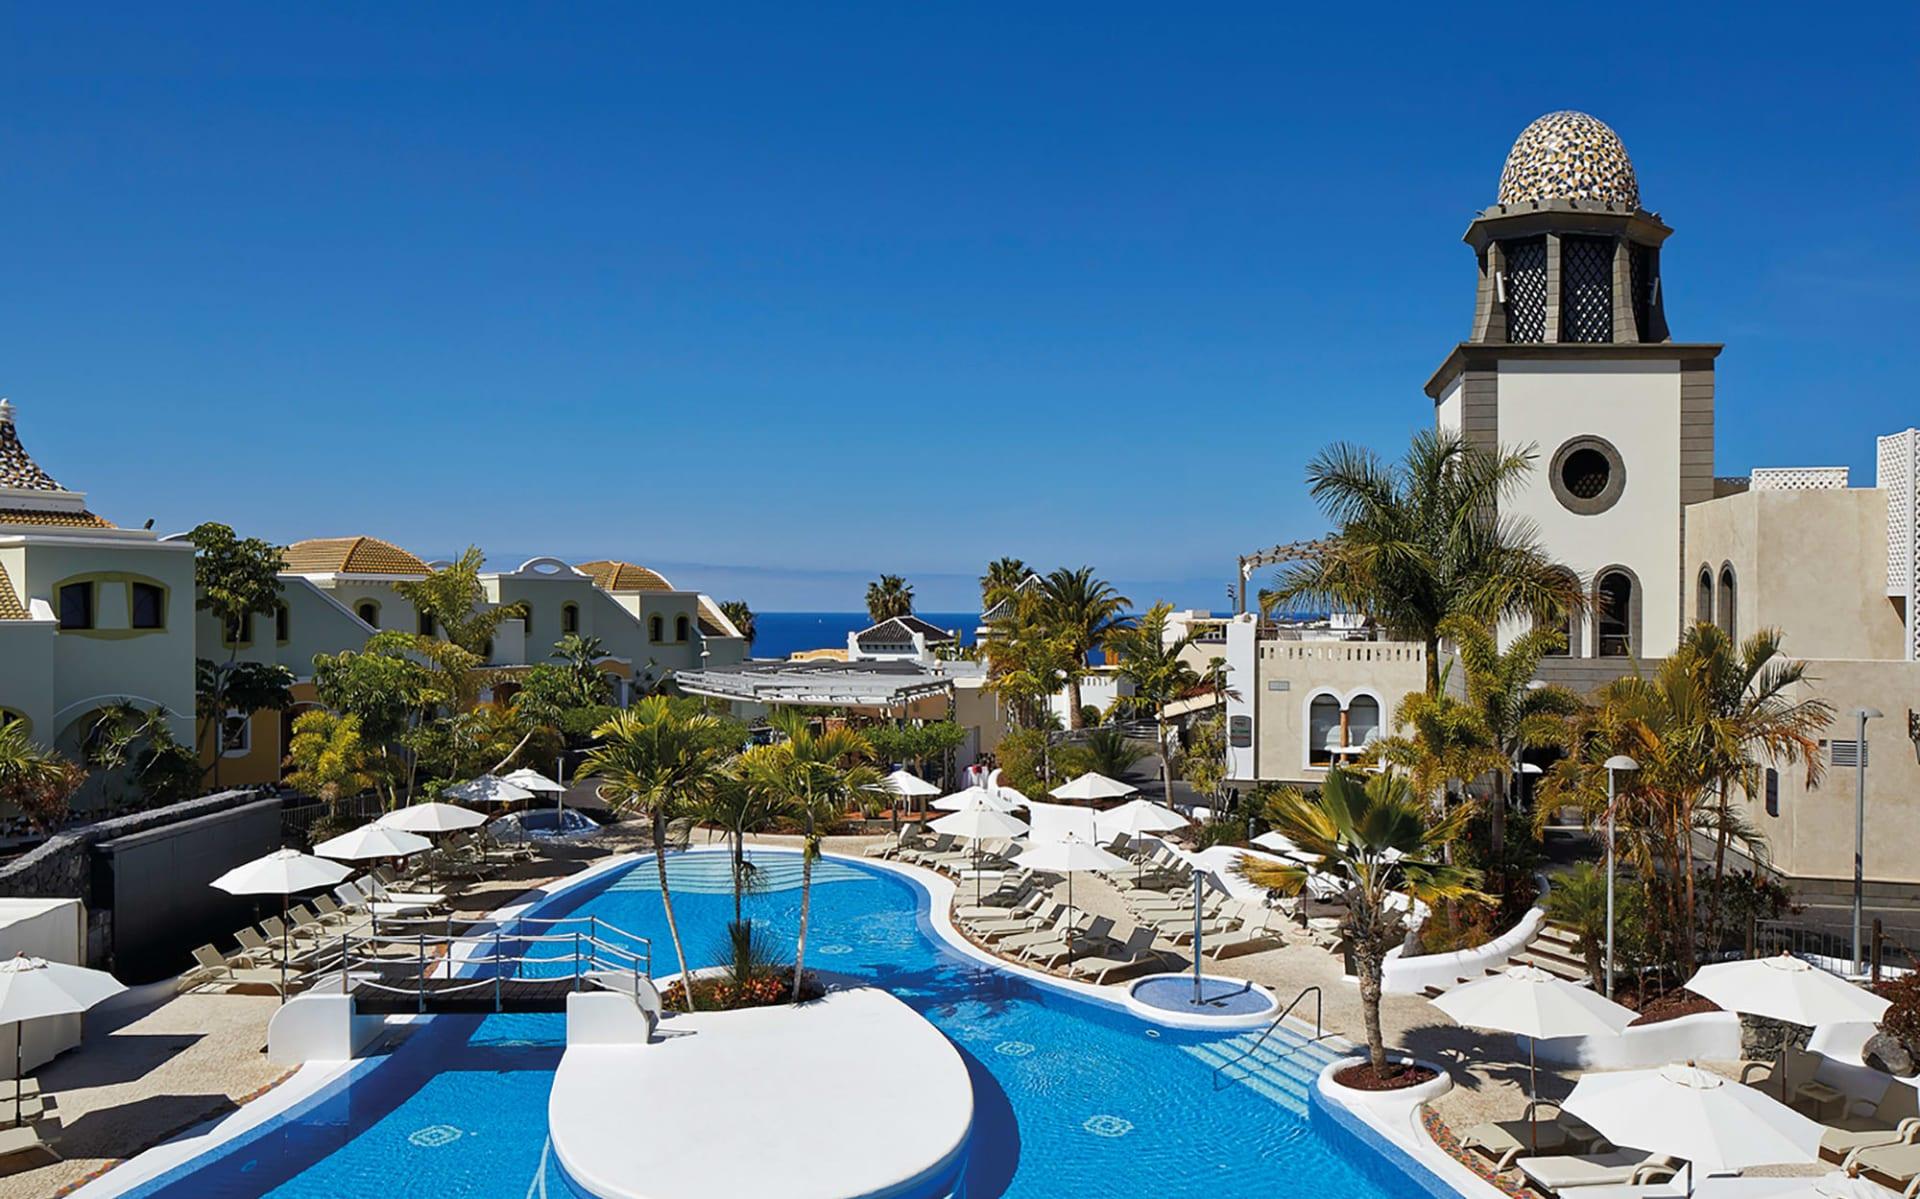 Hotel Suite Villa Maria in Teneriffa: Hotel Suite Villa Maria - Poolanlage